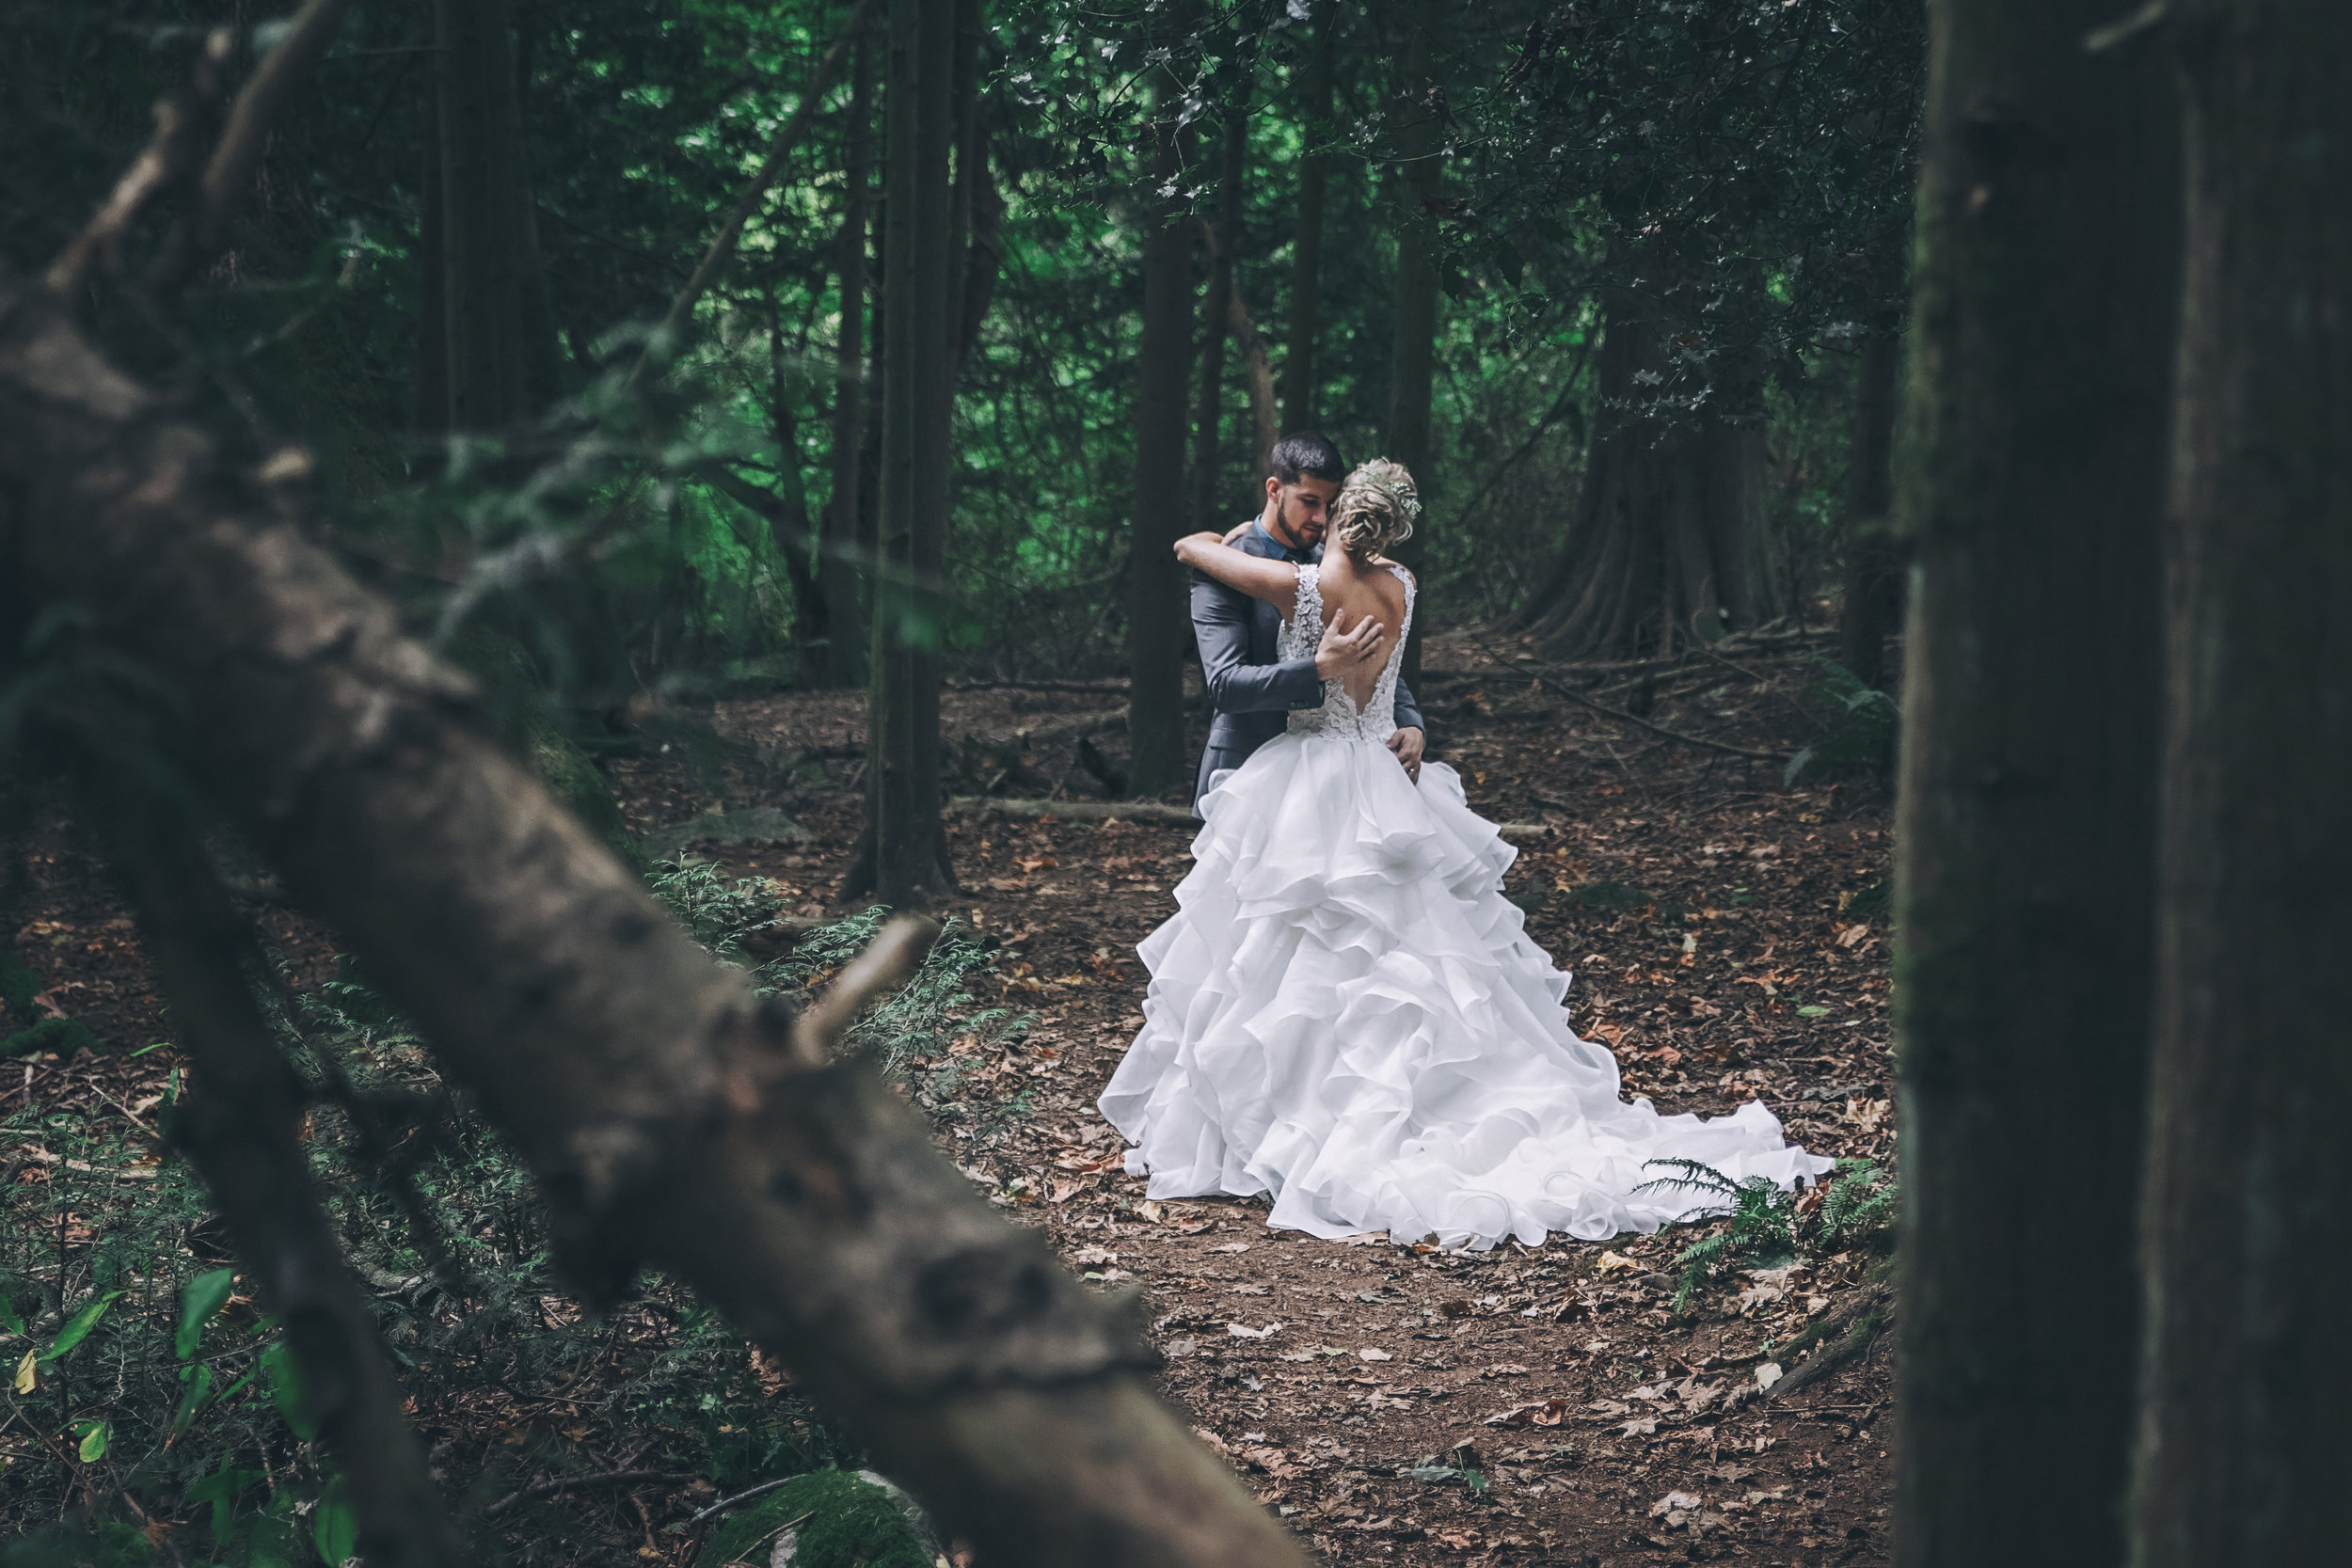 #woodland #wedding #whimsical #ballgown #connection #emotional #fairytale #princess #bride #groom #greywedding #etherealwedding #fairytalewedding #cathedralveil #veil #whitebouquet #simplyupdo #messyupdo #redlips #pearl #babysbreath #white #forestwedding